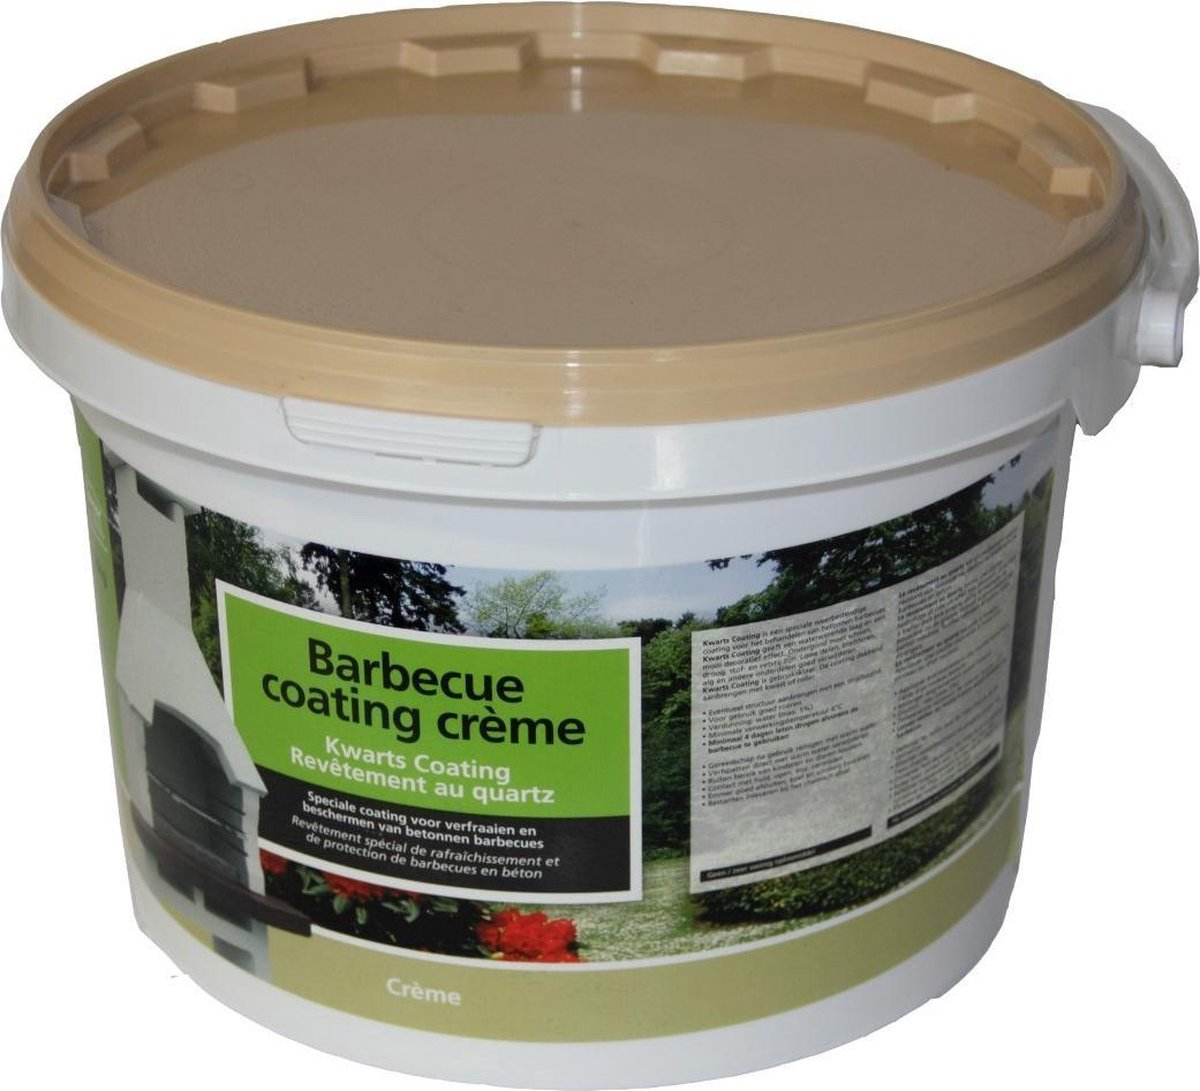 Decor betonnen barbecue coating crème 8kg